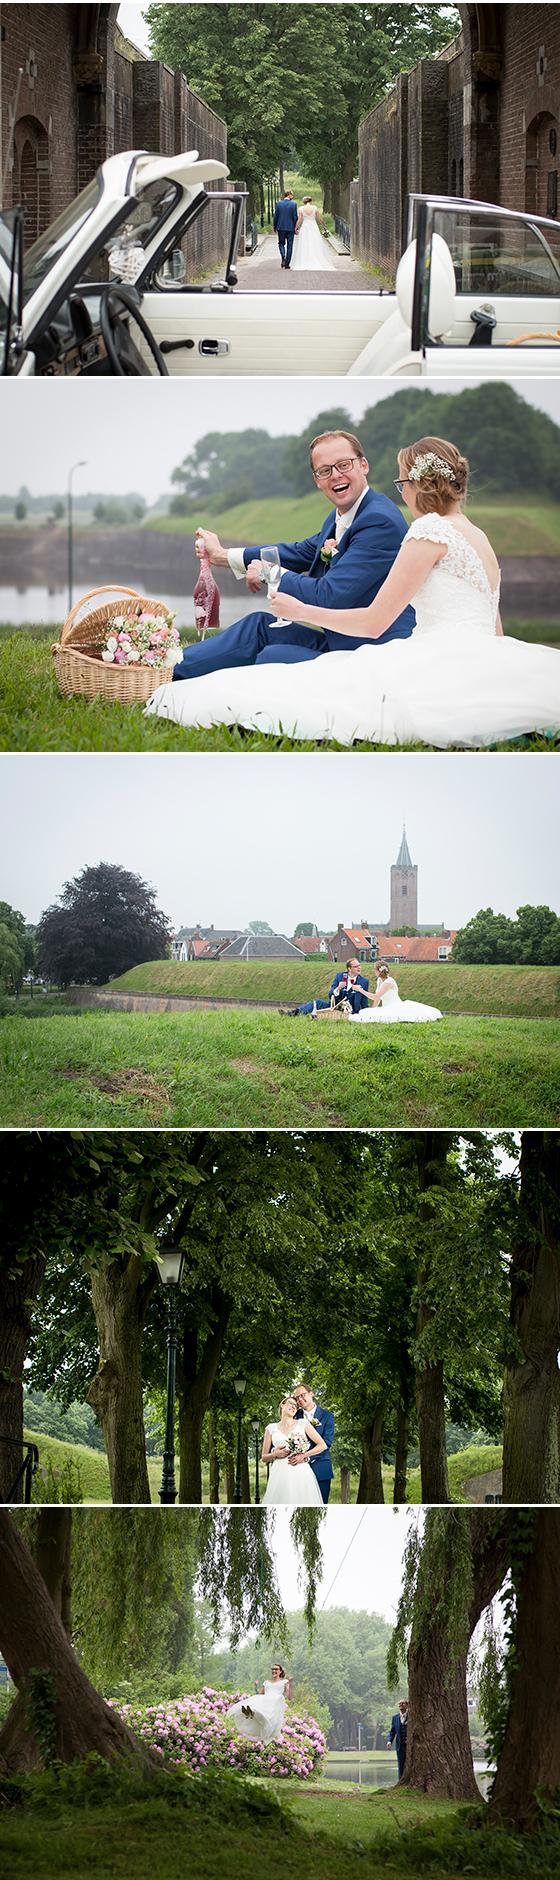 trouwfotograaf bruidsfotograaf t gooi